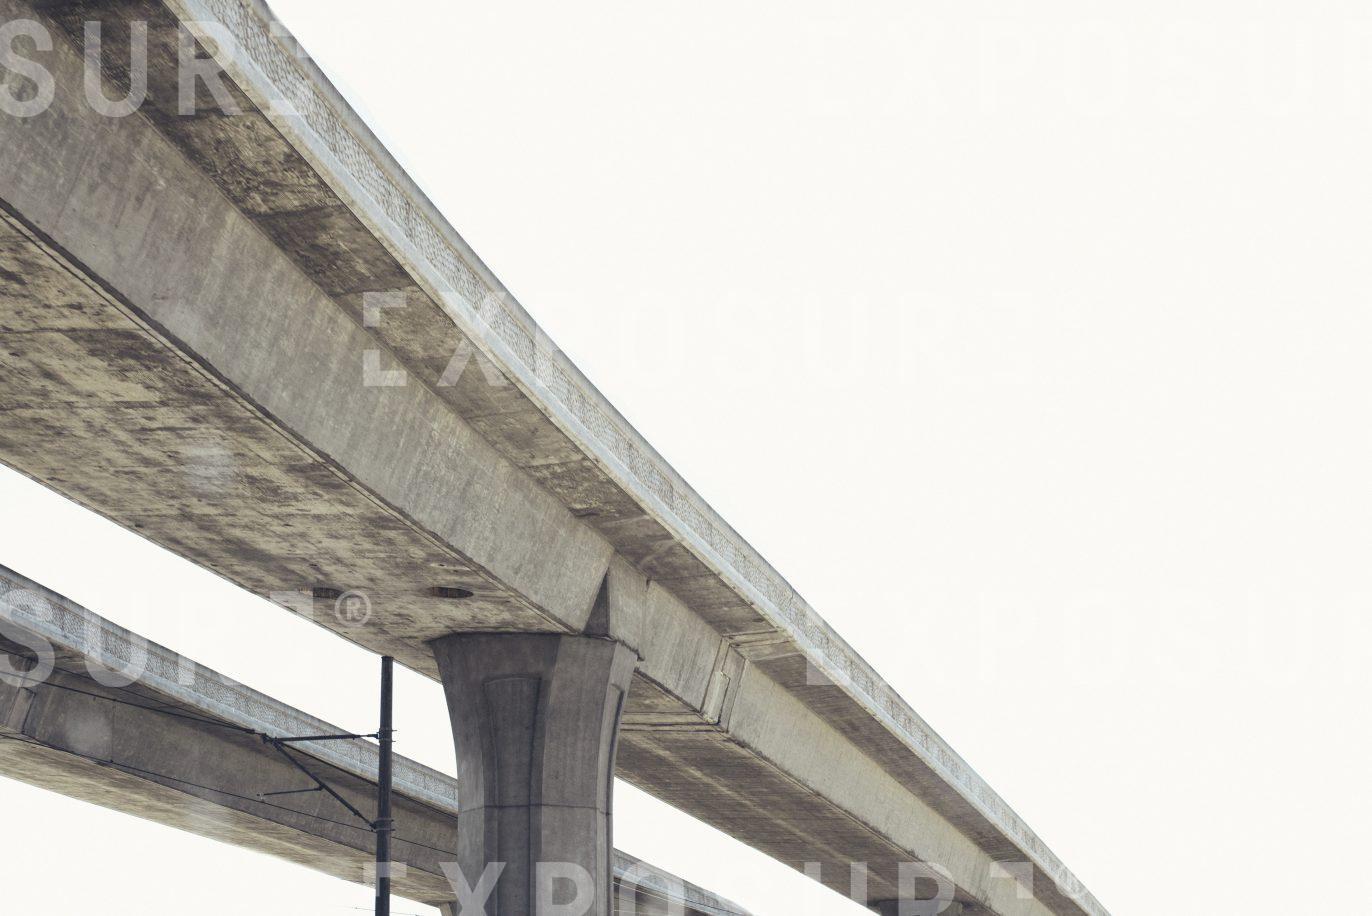 Concrete highway